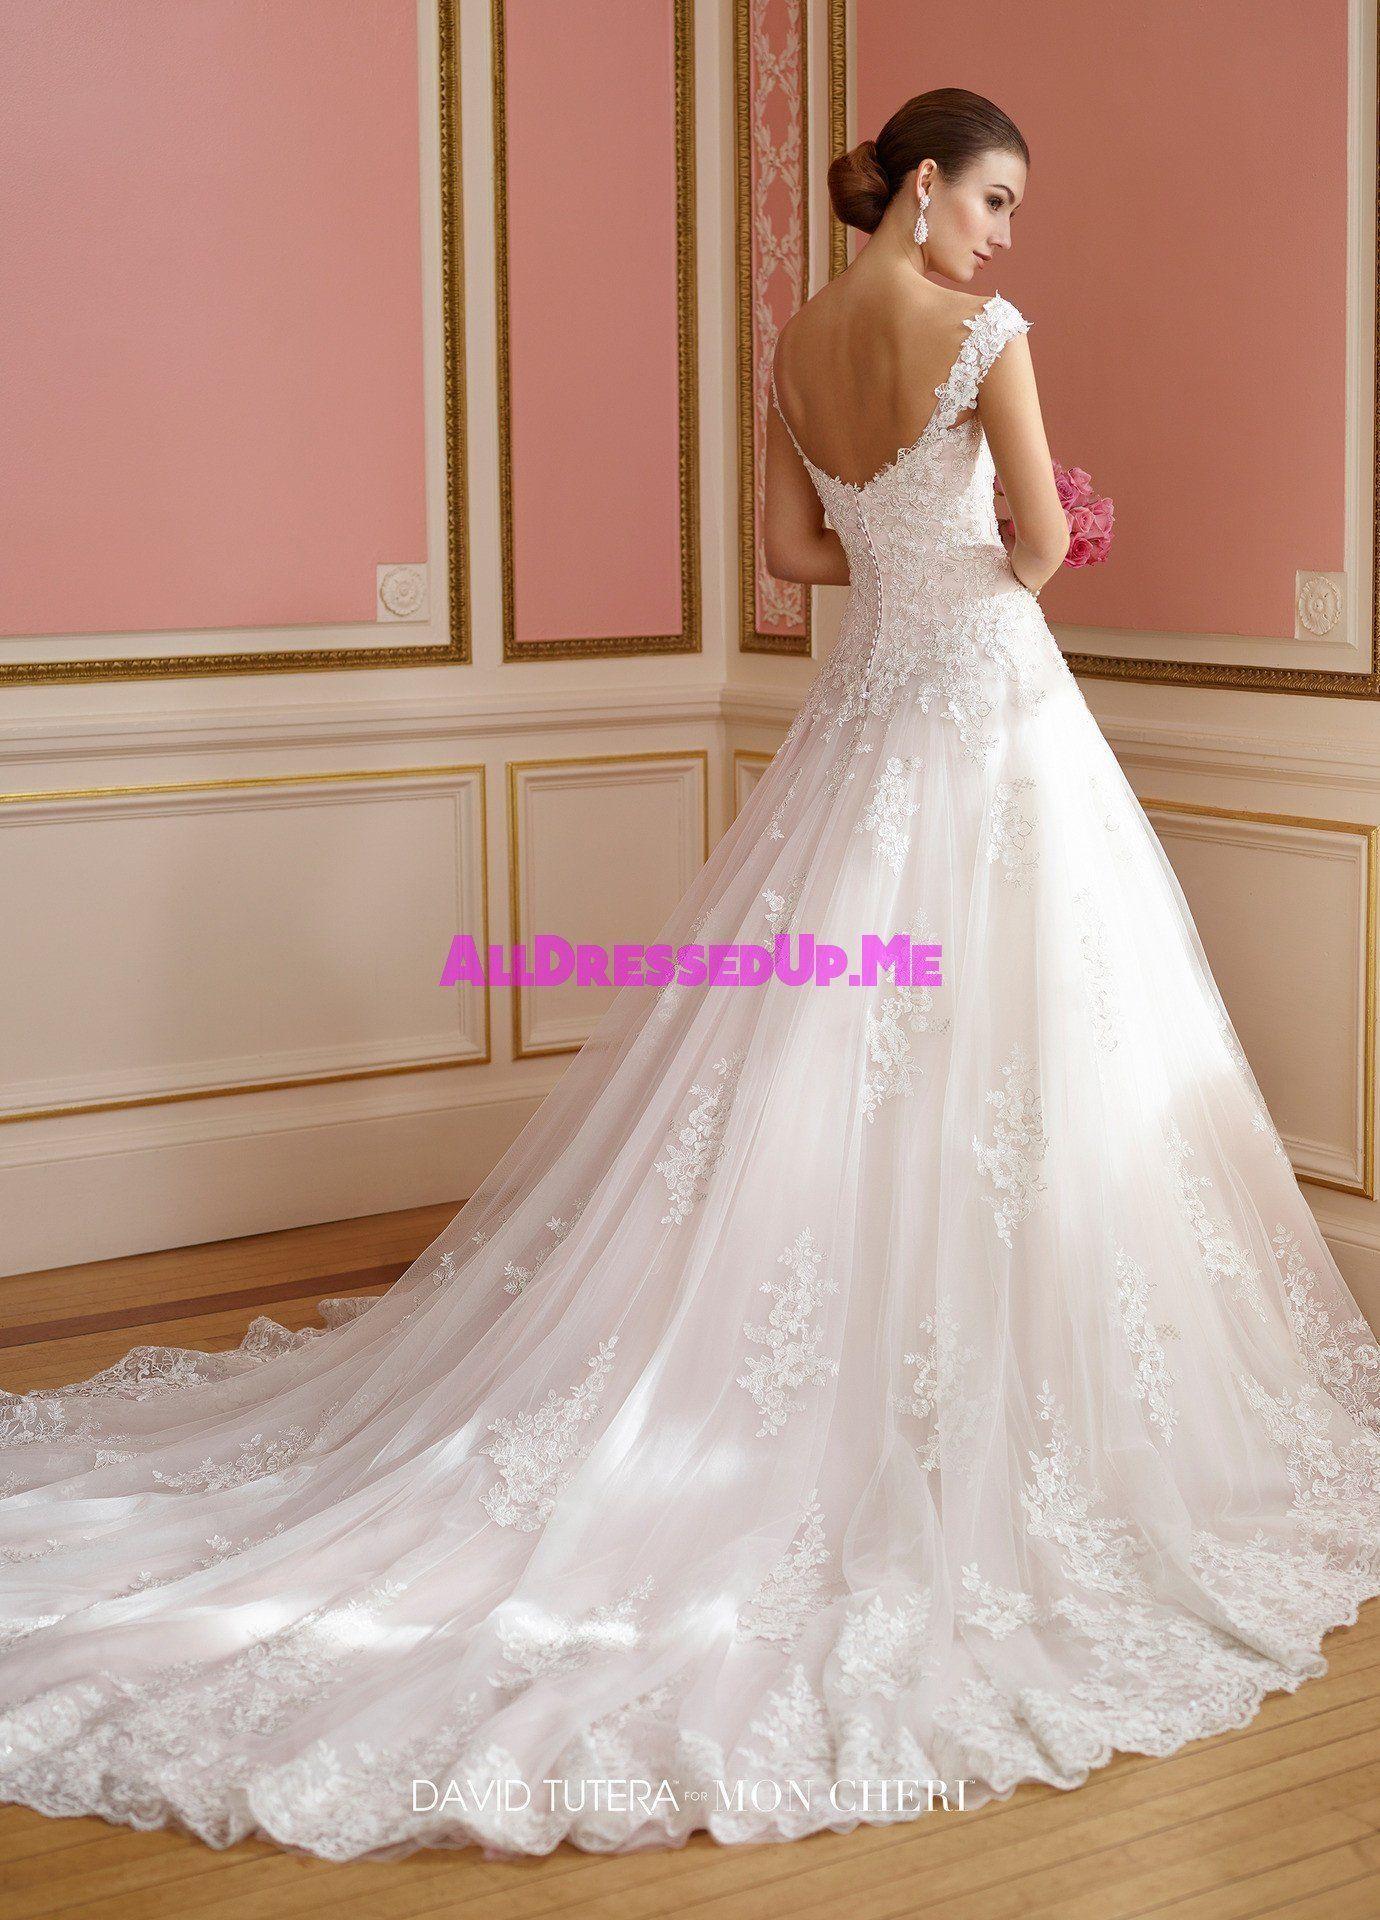 4d28c8a0797f2 Last Dress In Stock; Size: 18, Color: Ivory - Martin Thornburg - 217210 -  Nellie - Mon Cheri - 18 - Wedding Gowns Dresses Chattanooga Hixson Shops  Boutiques ...